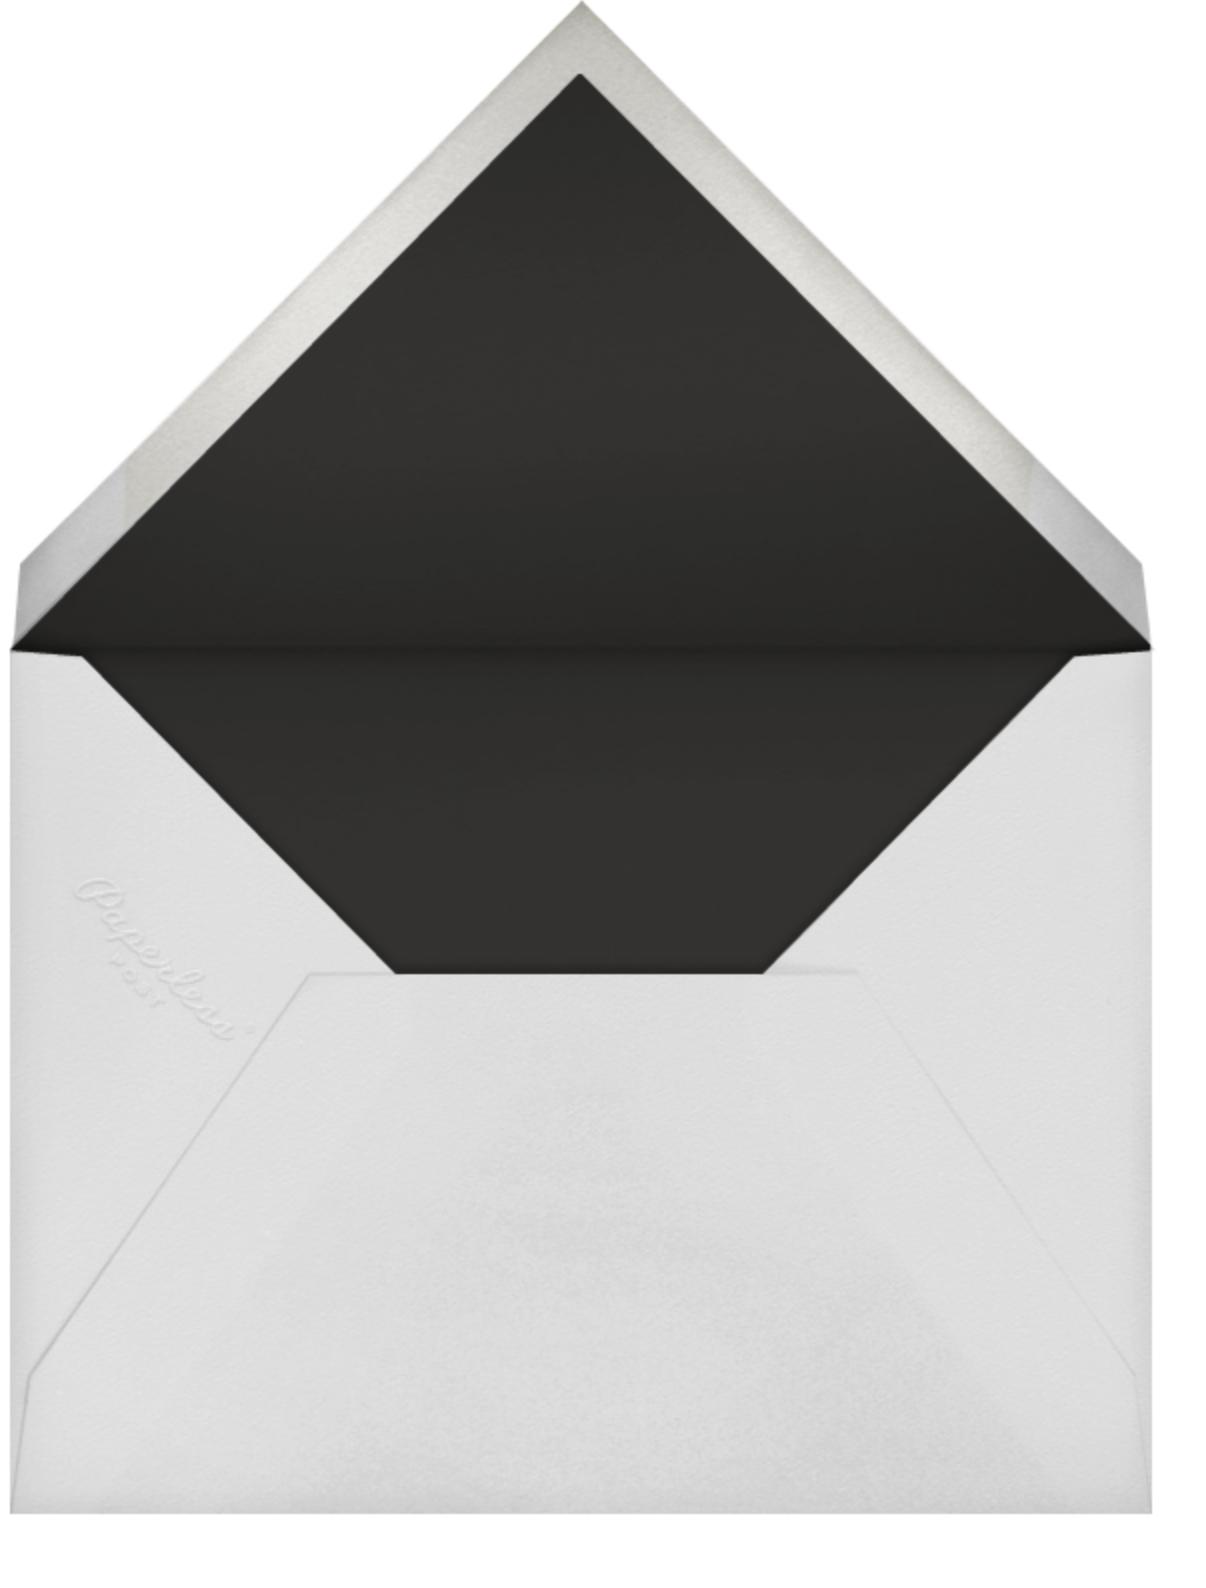 Richmond Park (Stationery) - Navy/Rose Gold - Oscar de la Renta - Wedding - envelope back